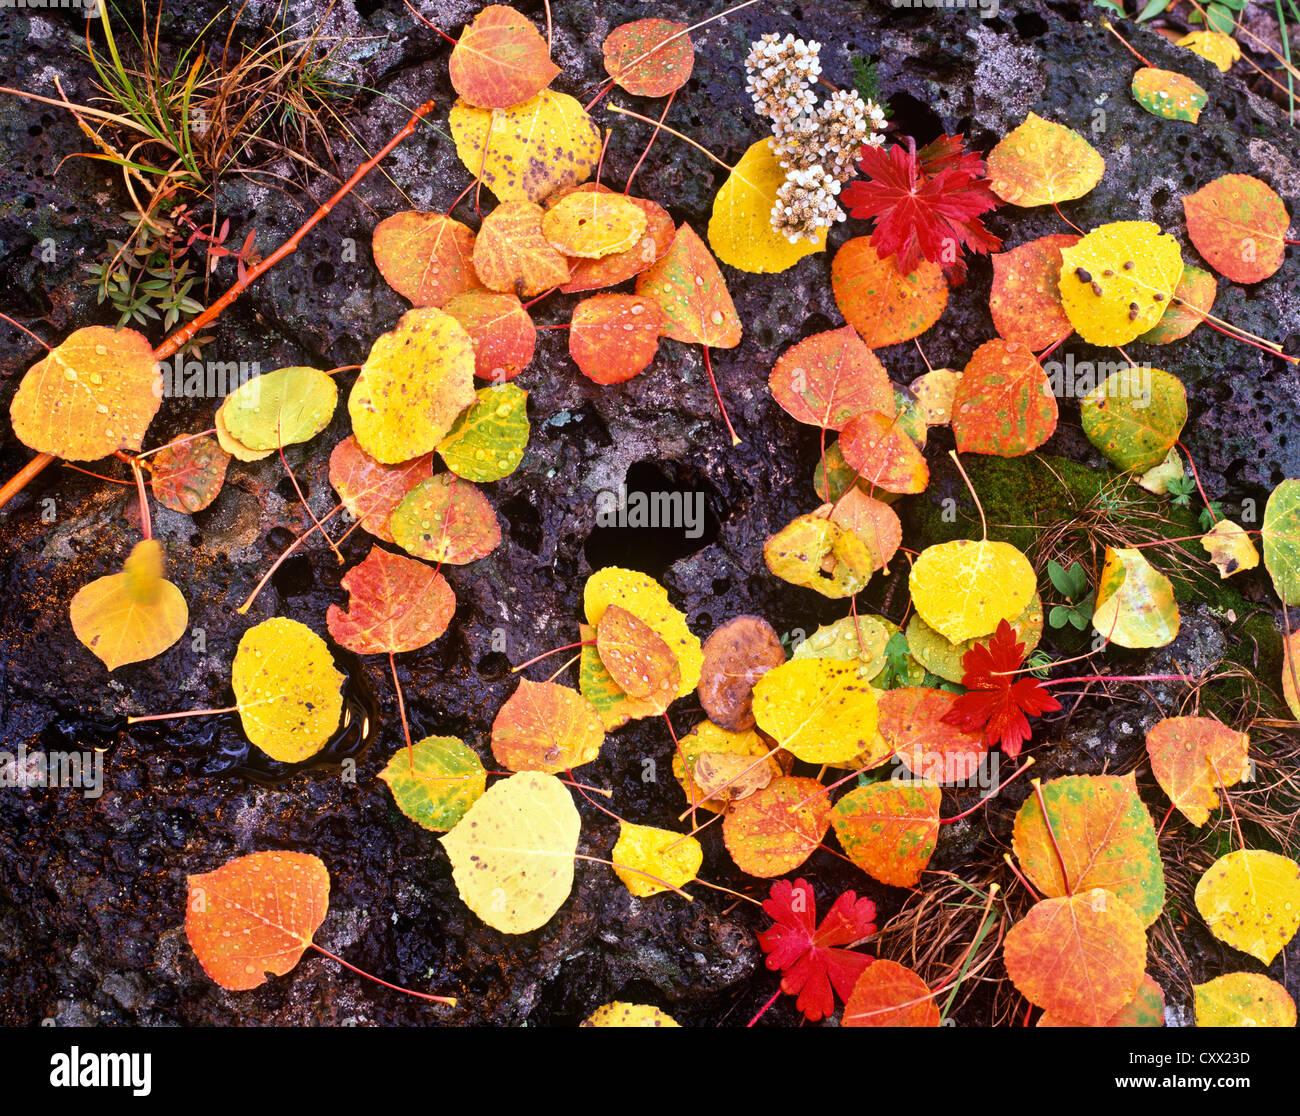 Saddle Mountain Wilderness Area, Marble Point overlook, Sunrise. Arizona.USA Autumn Colors. - Stock Image